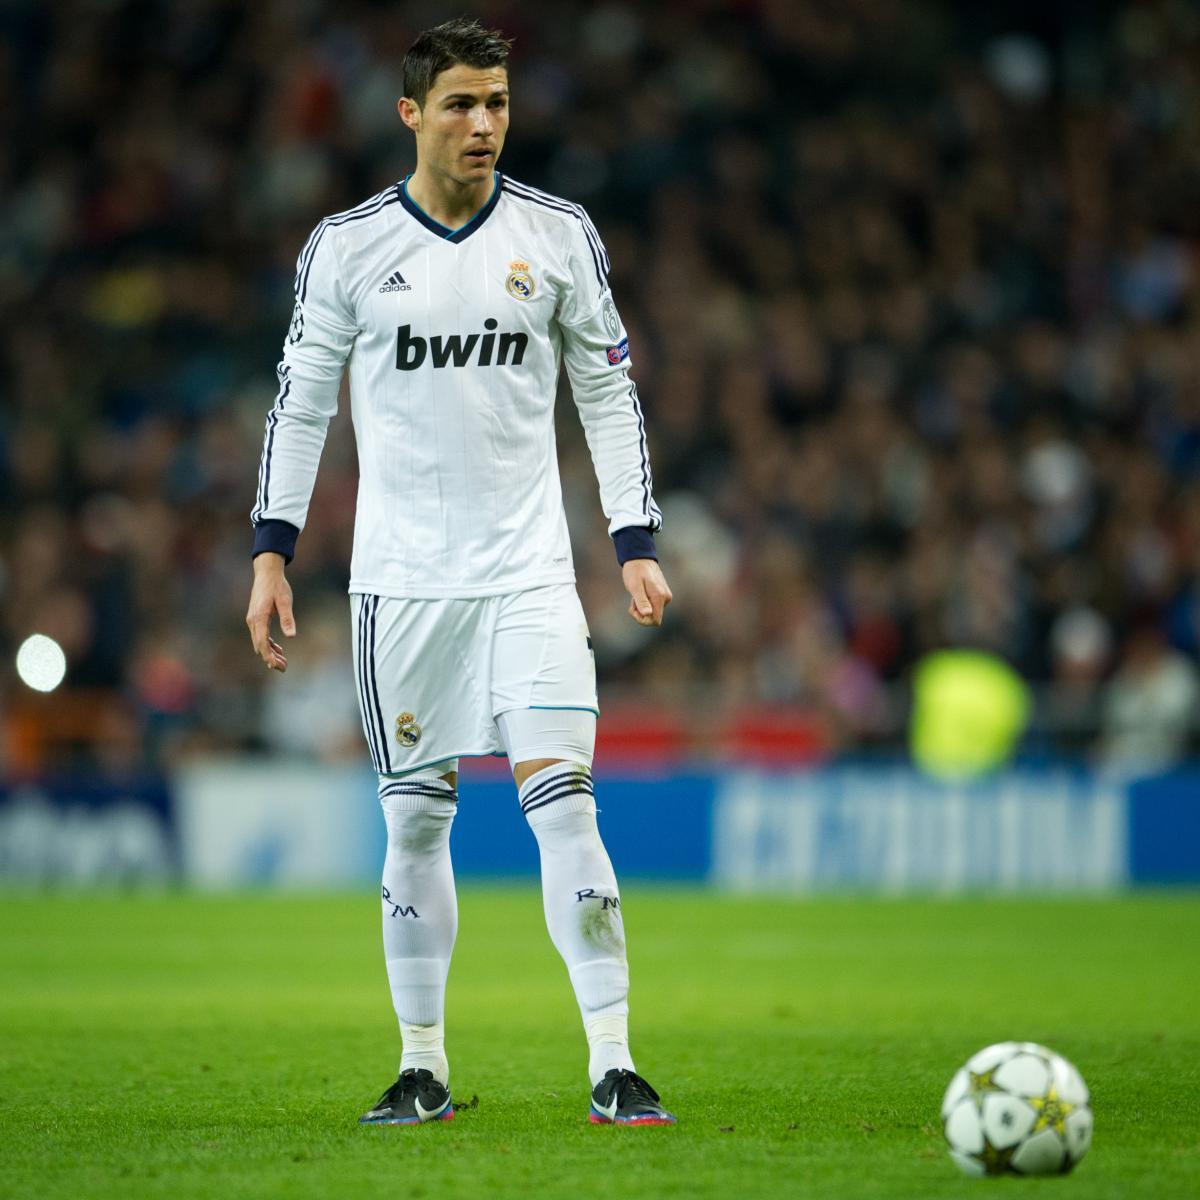 Golf Kiwi Ko Not At Top Just Yet: UEFA Champions League Draw 2012-13: Ranking Last 16